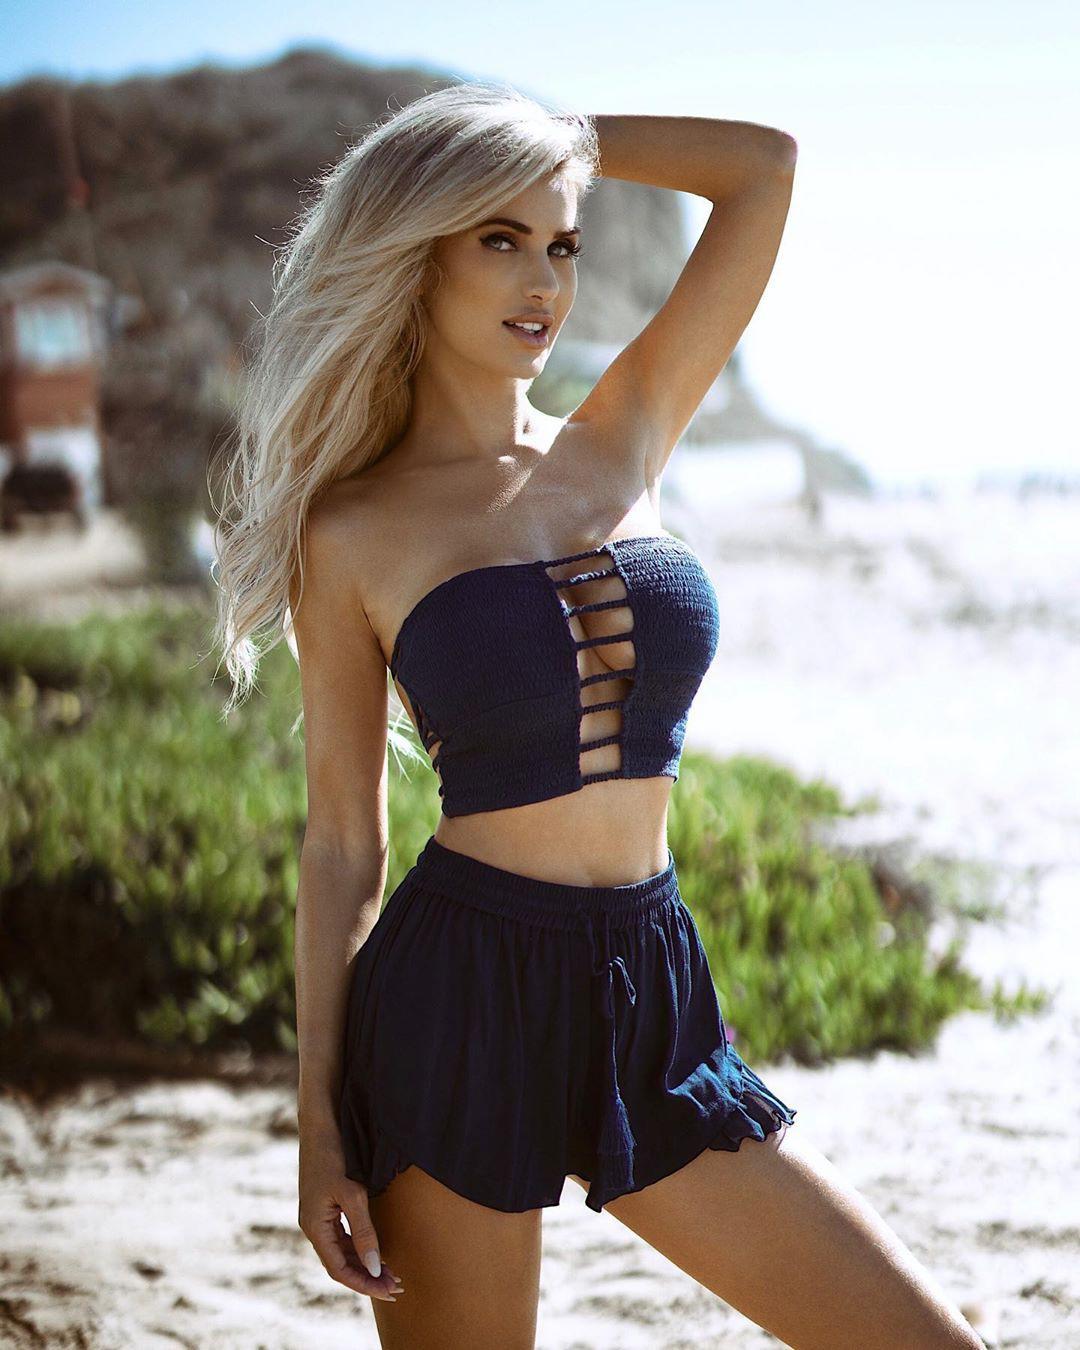 Leanna Bartlett bikini dress for women, fashion photoshoot, Cute Model Pics